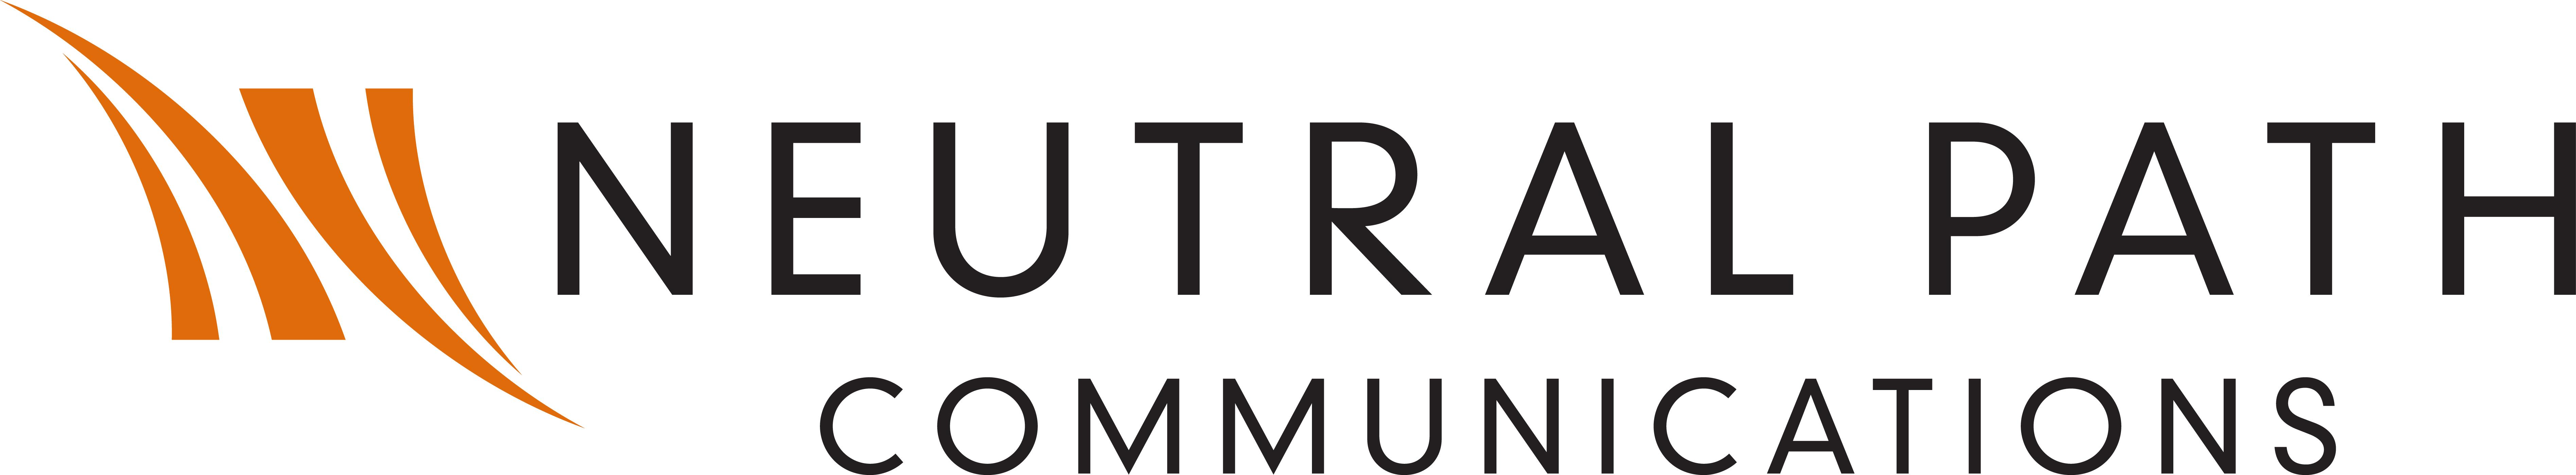 Neutral Path Communications